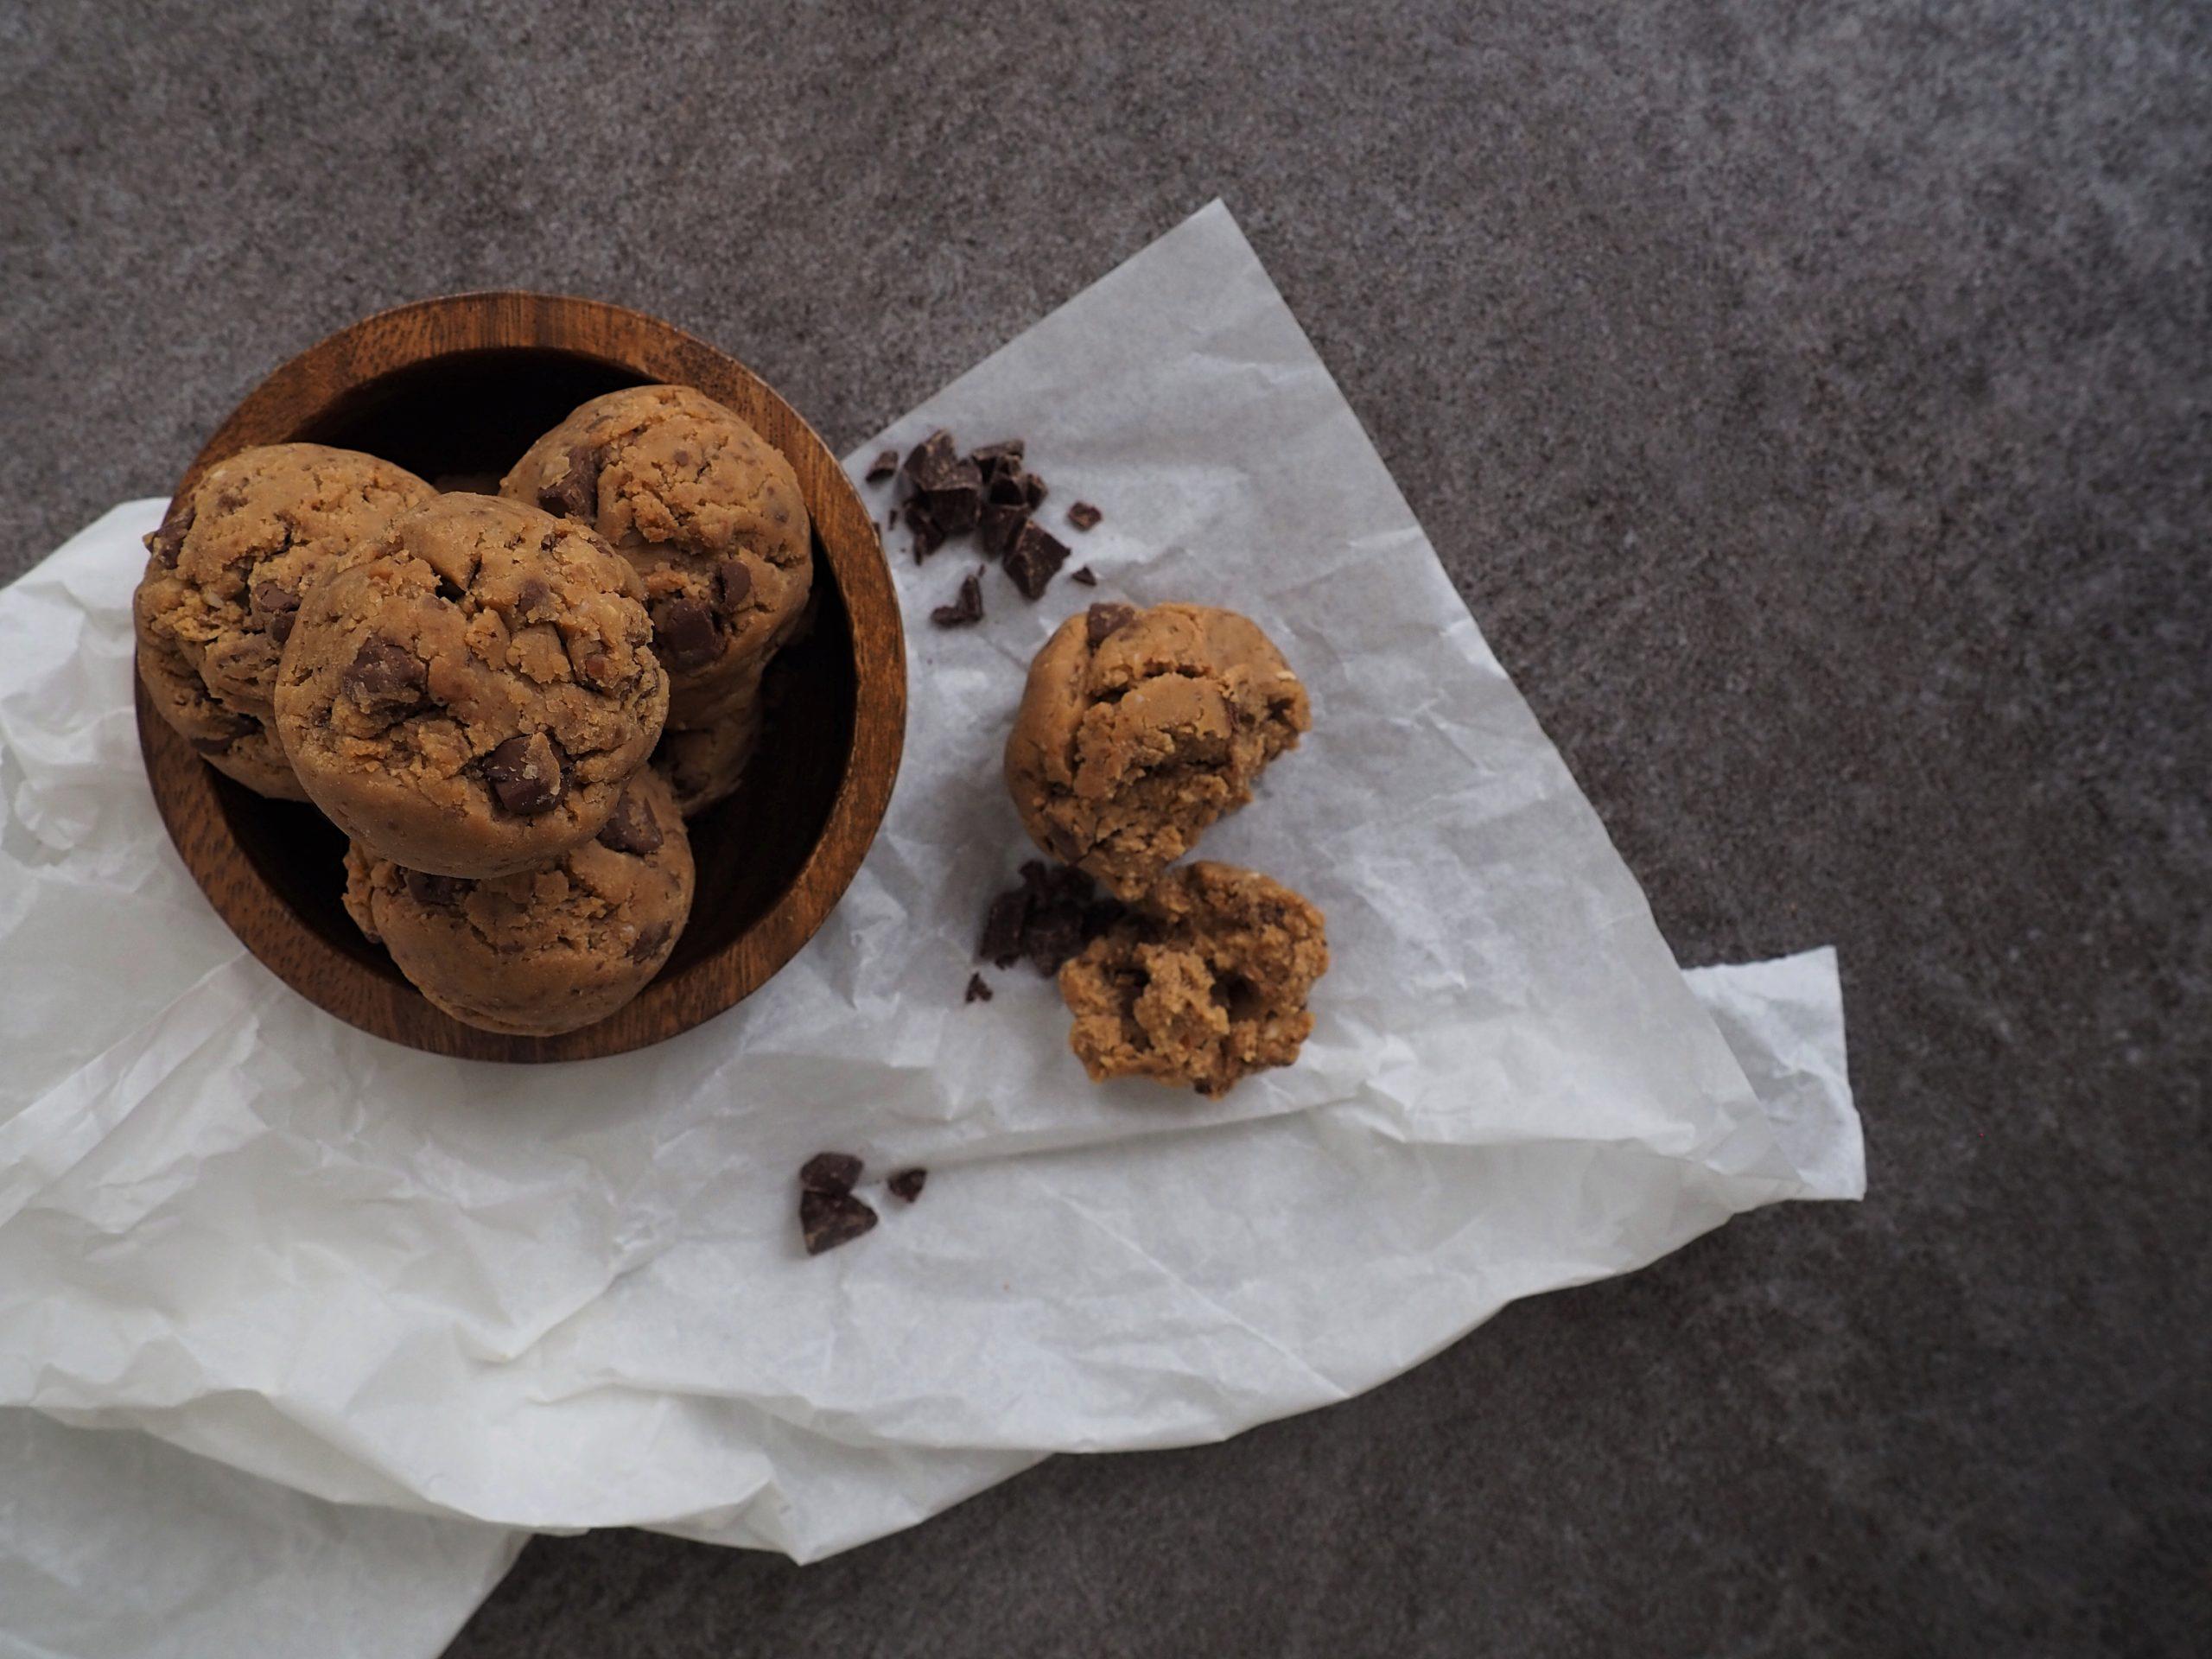 Vegan Cookie Dough; essbarer Keksteig